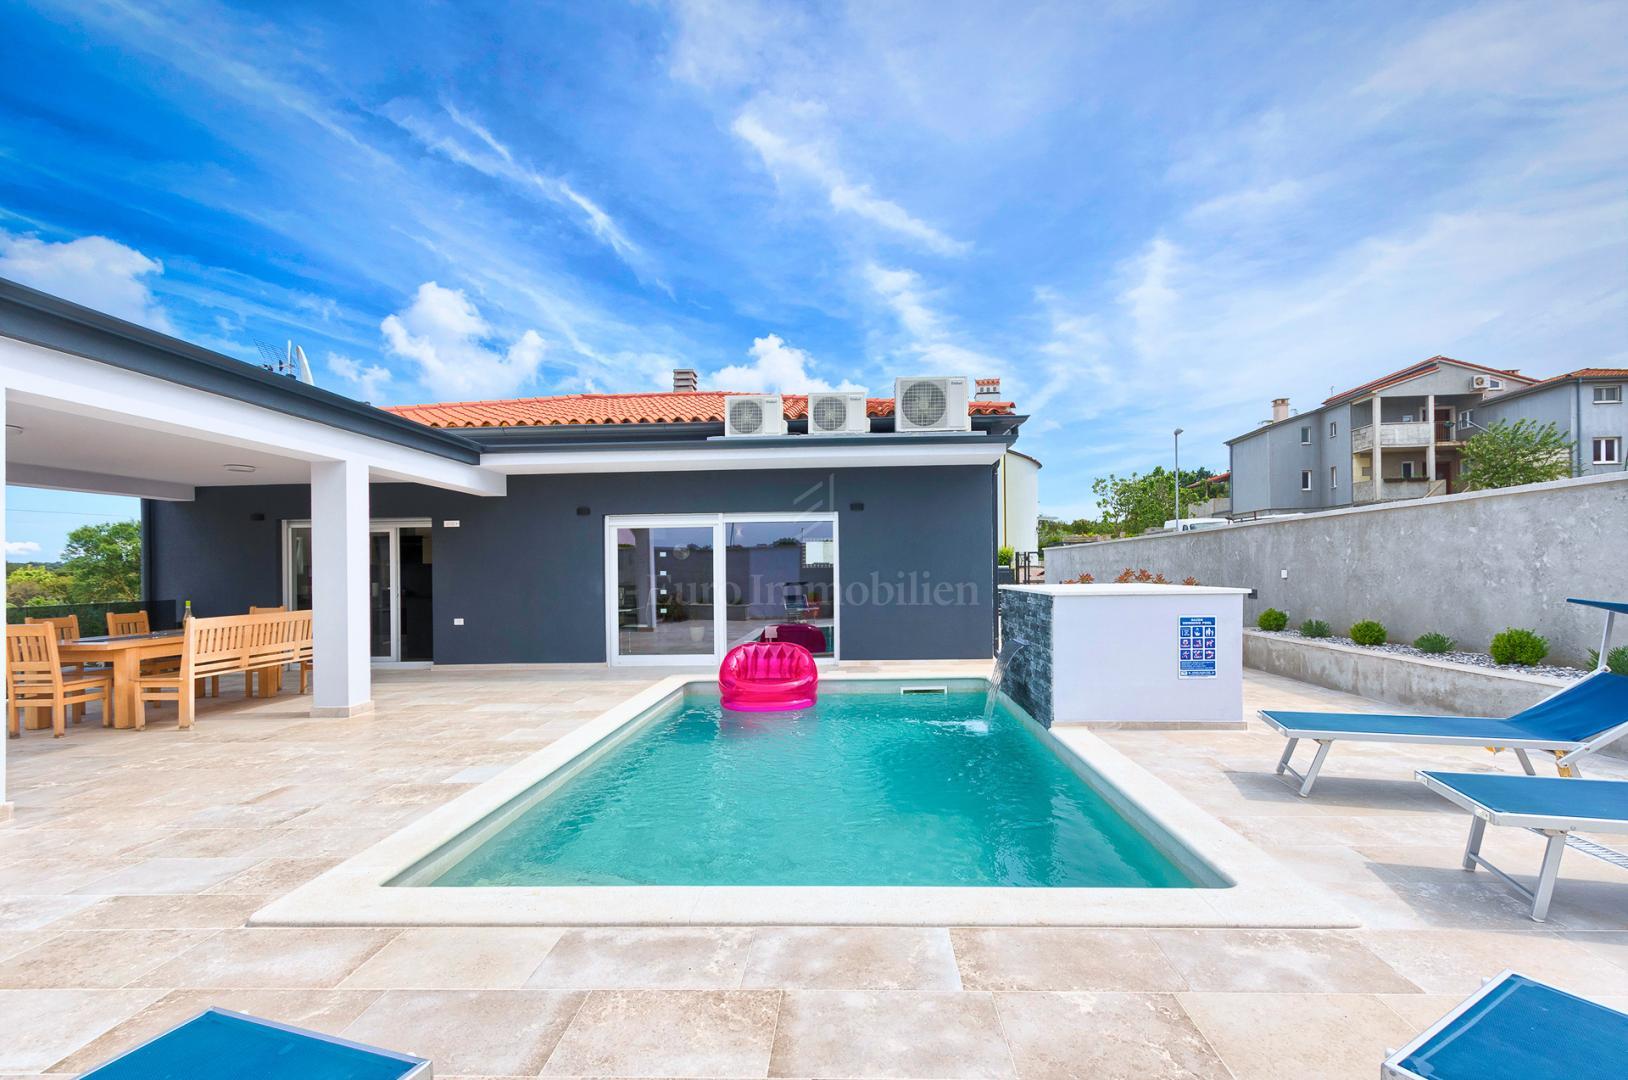 Neues Haus mit Pool! Modernes Design!, Haus